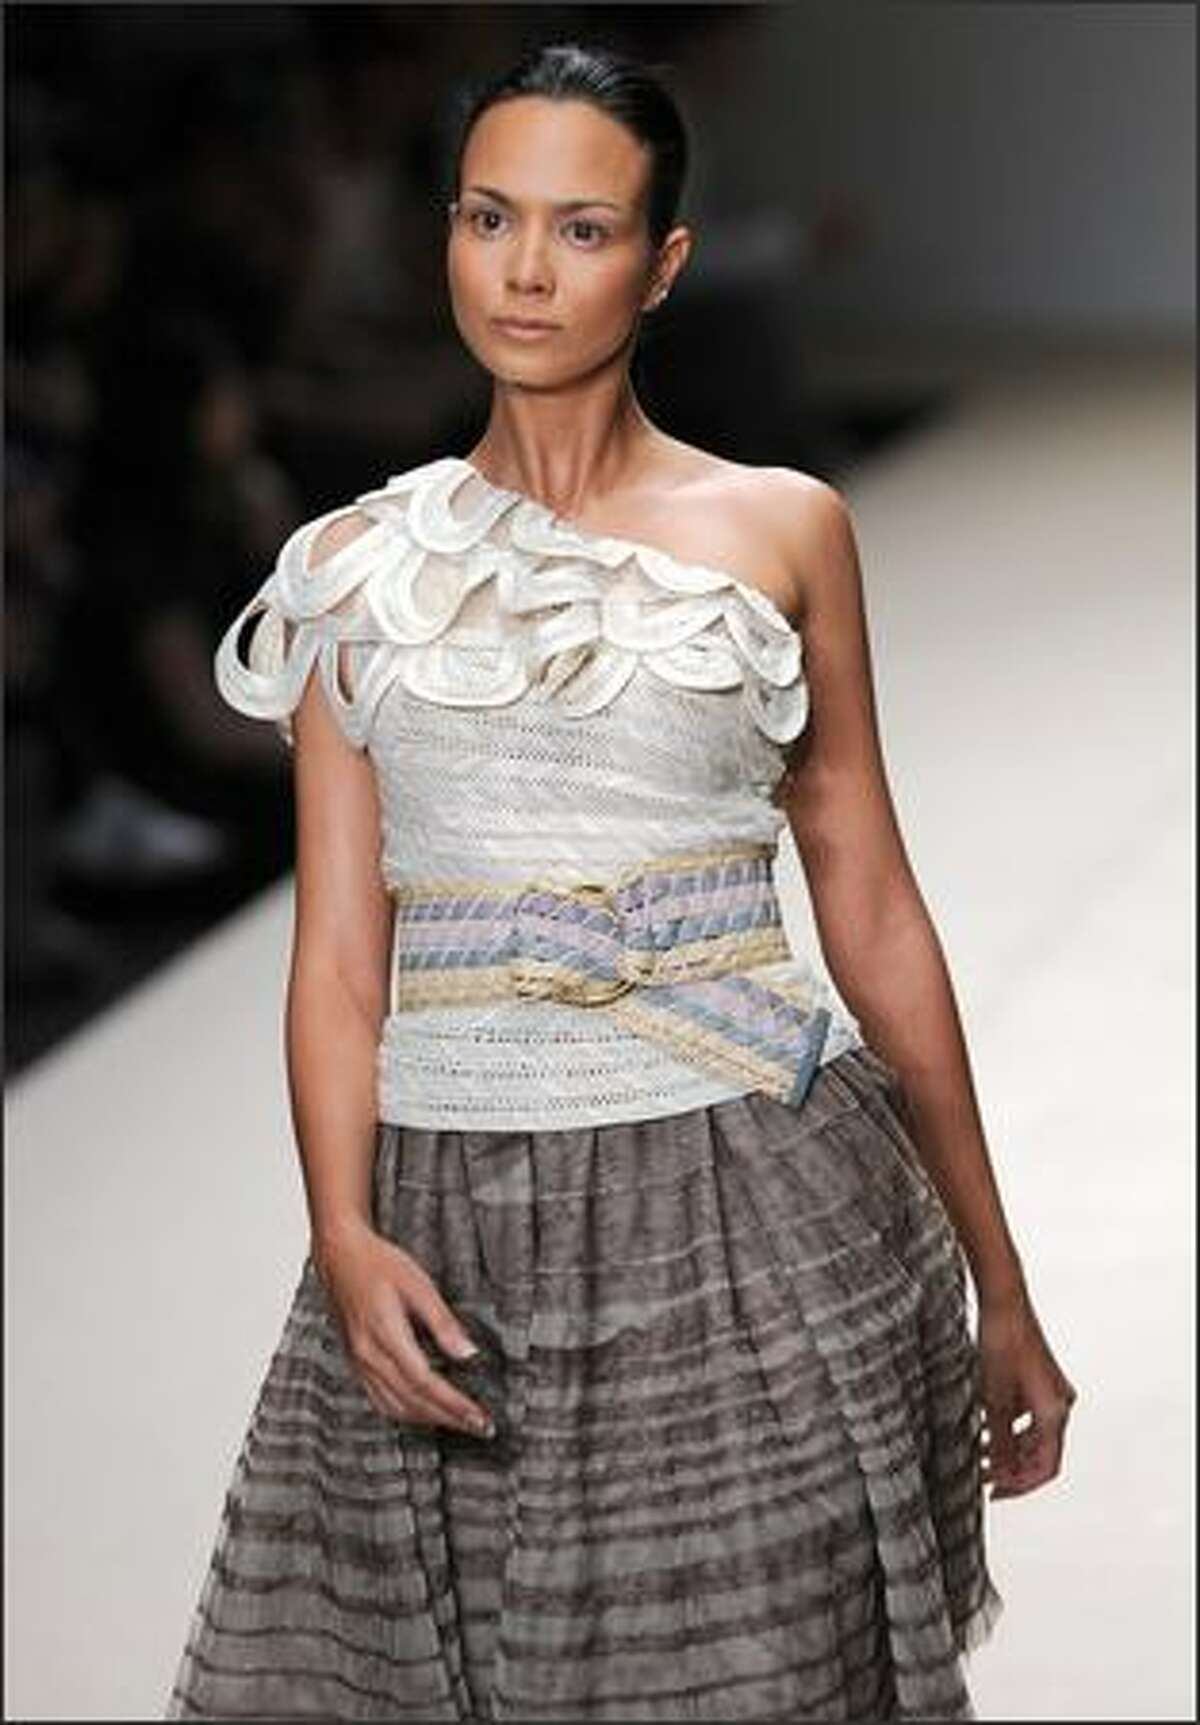 A model walks the runway wearing outfits of Kai by Thai designer Somchai Kawtong.